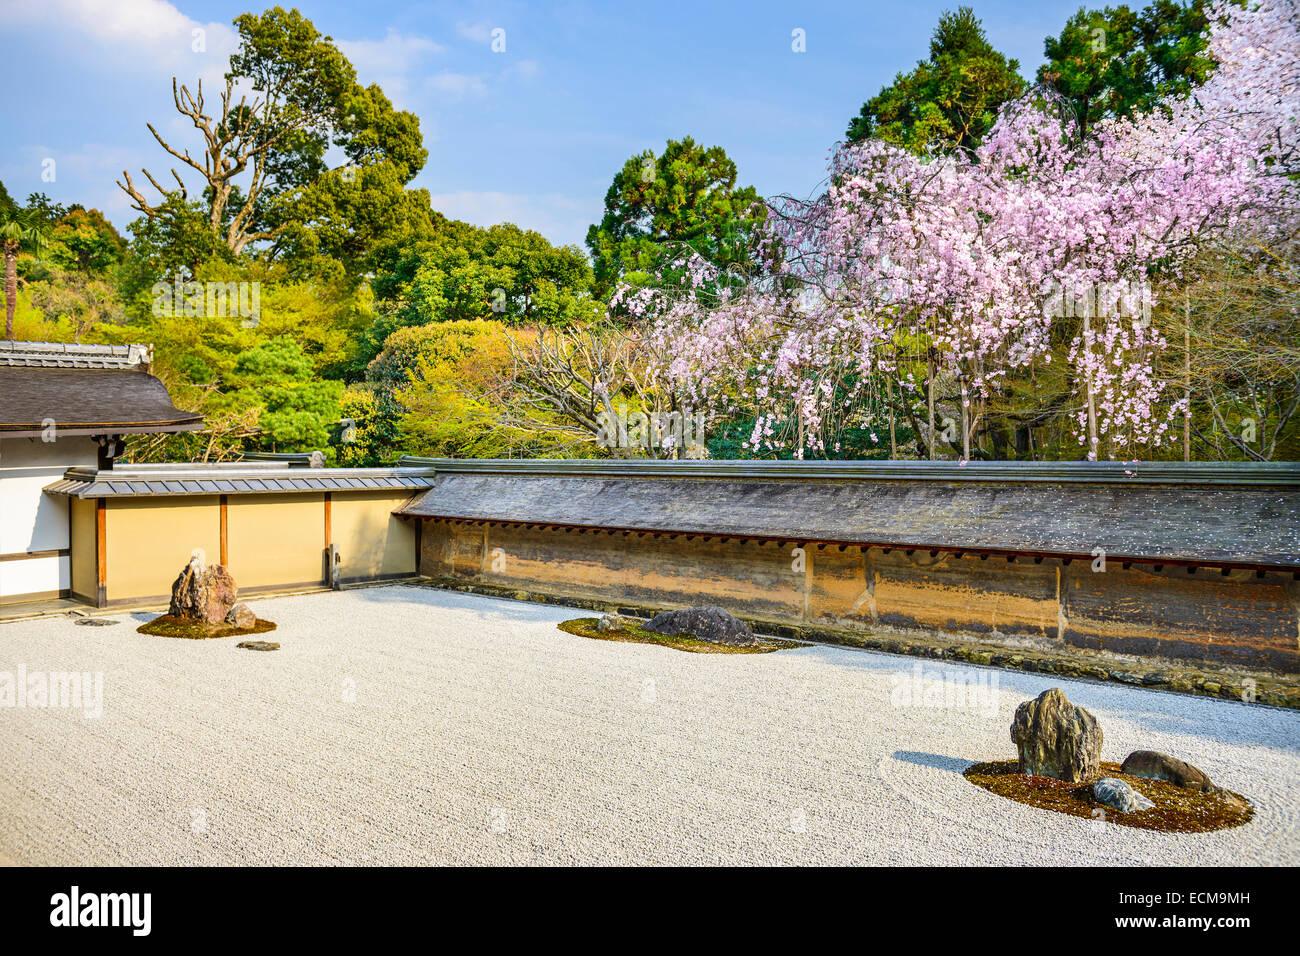 kyoto japan at ryoan ji temple zen garden in the spring season